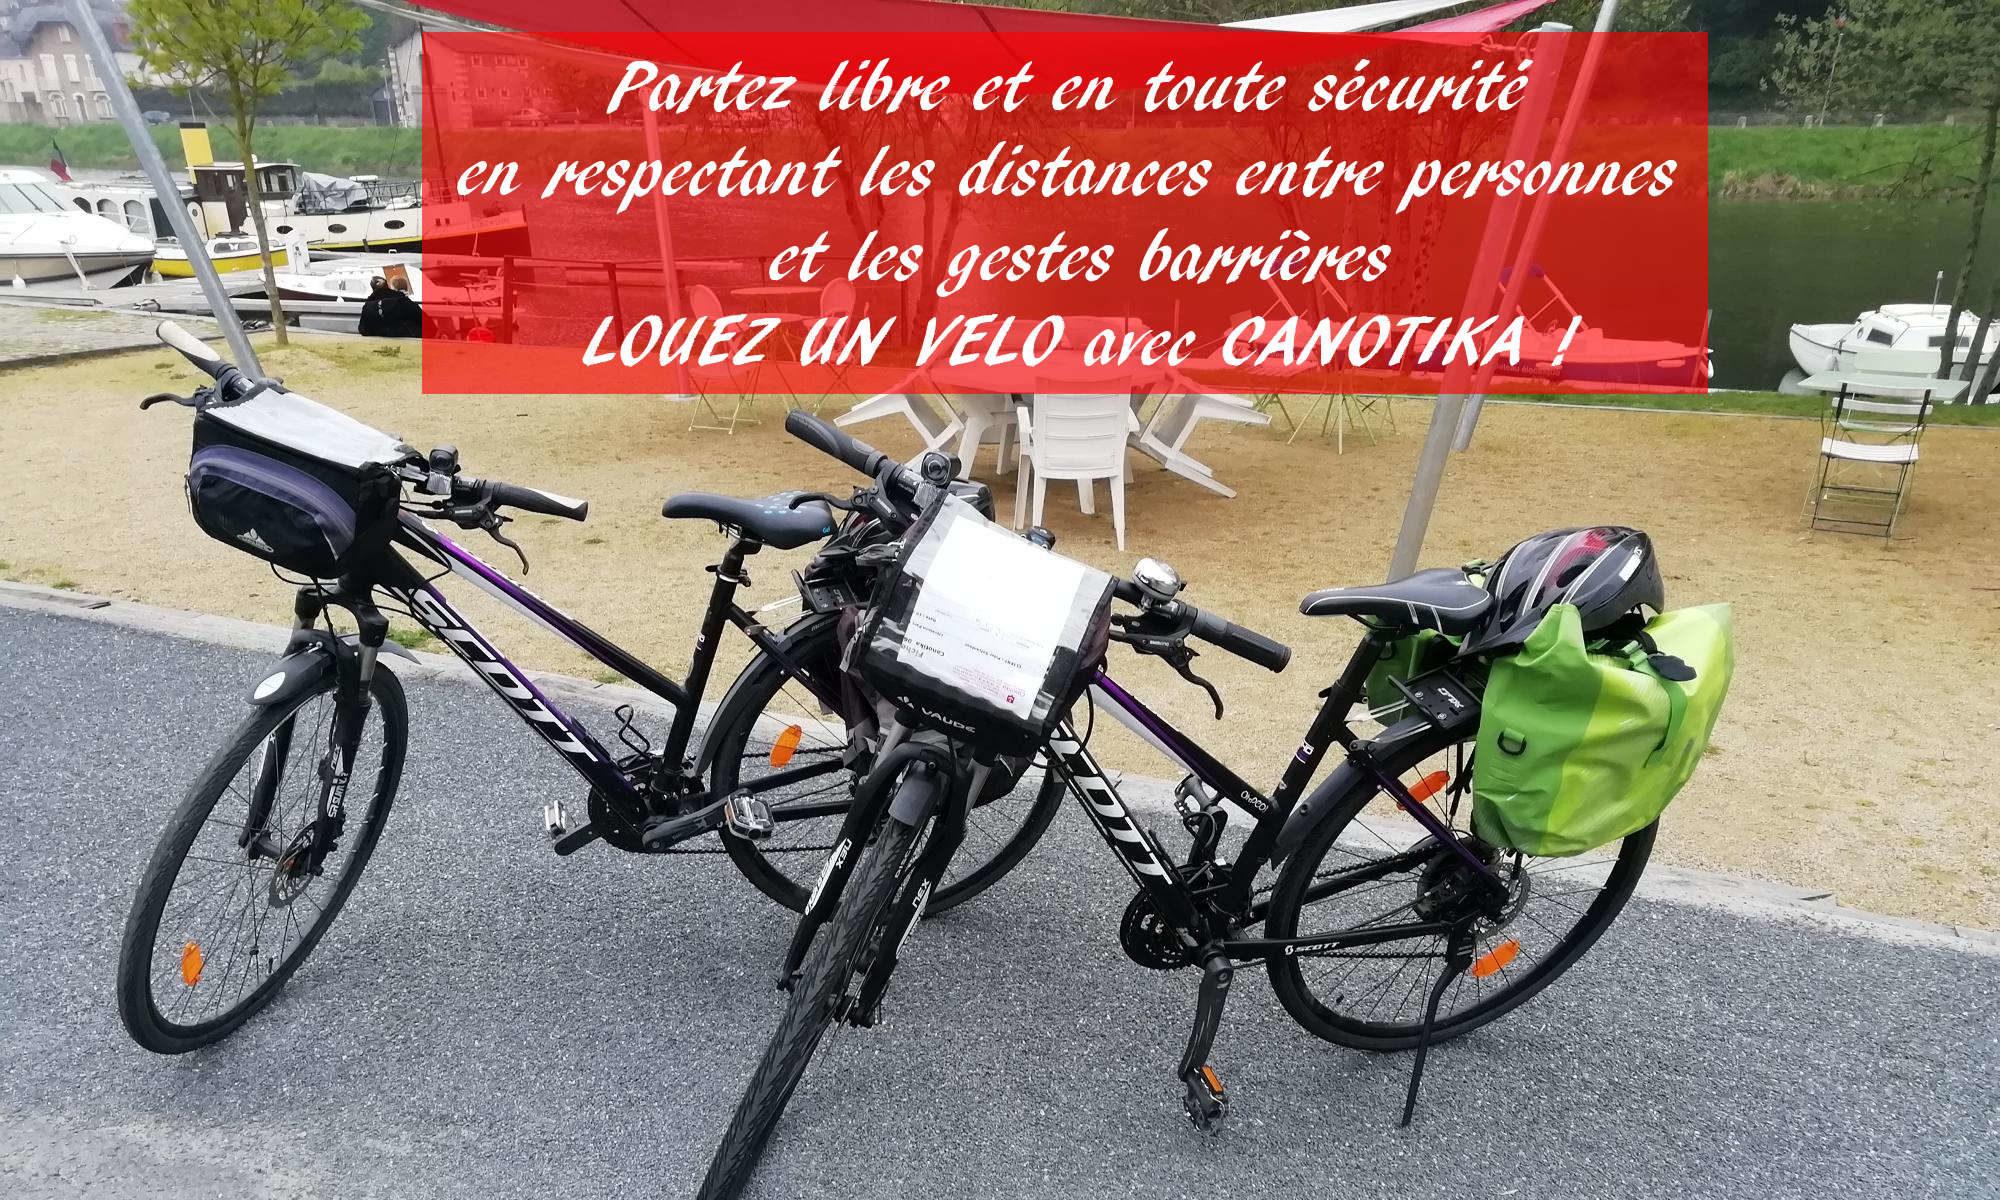 Lovation de vélos randonnée et balade